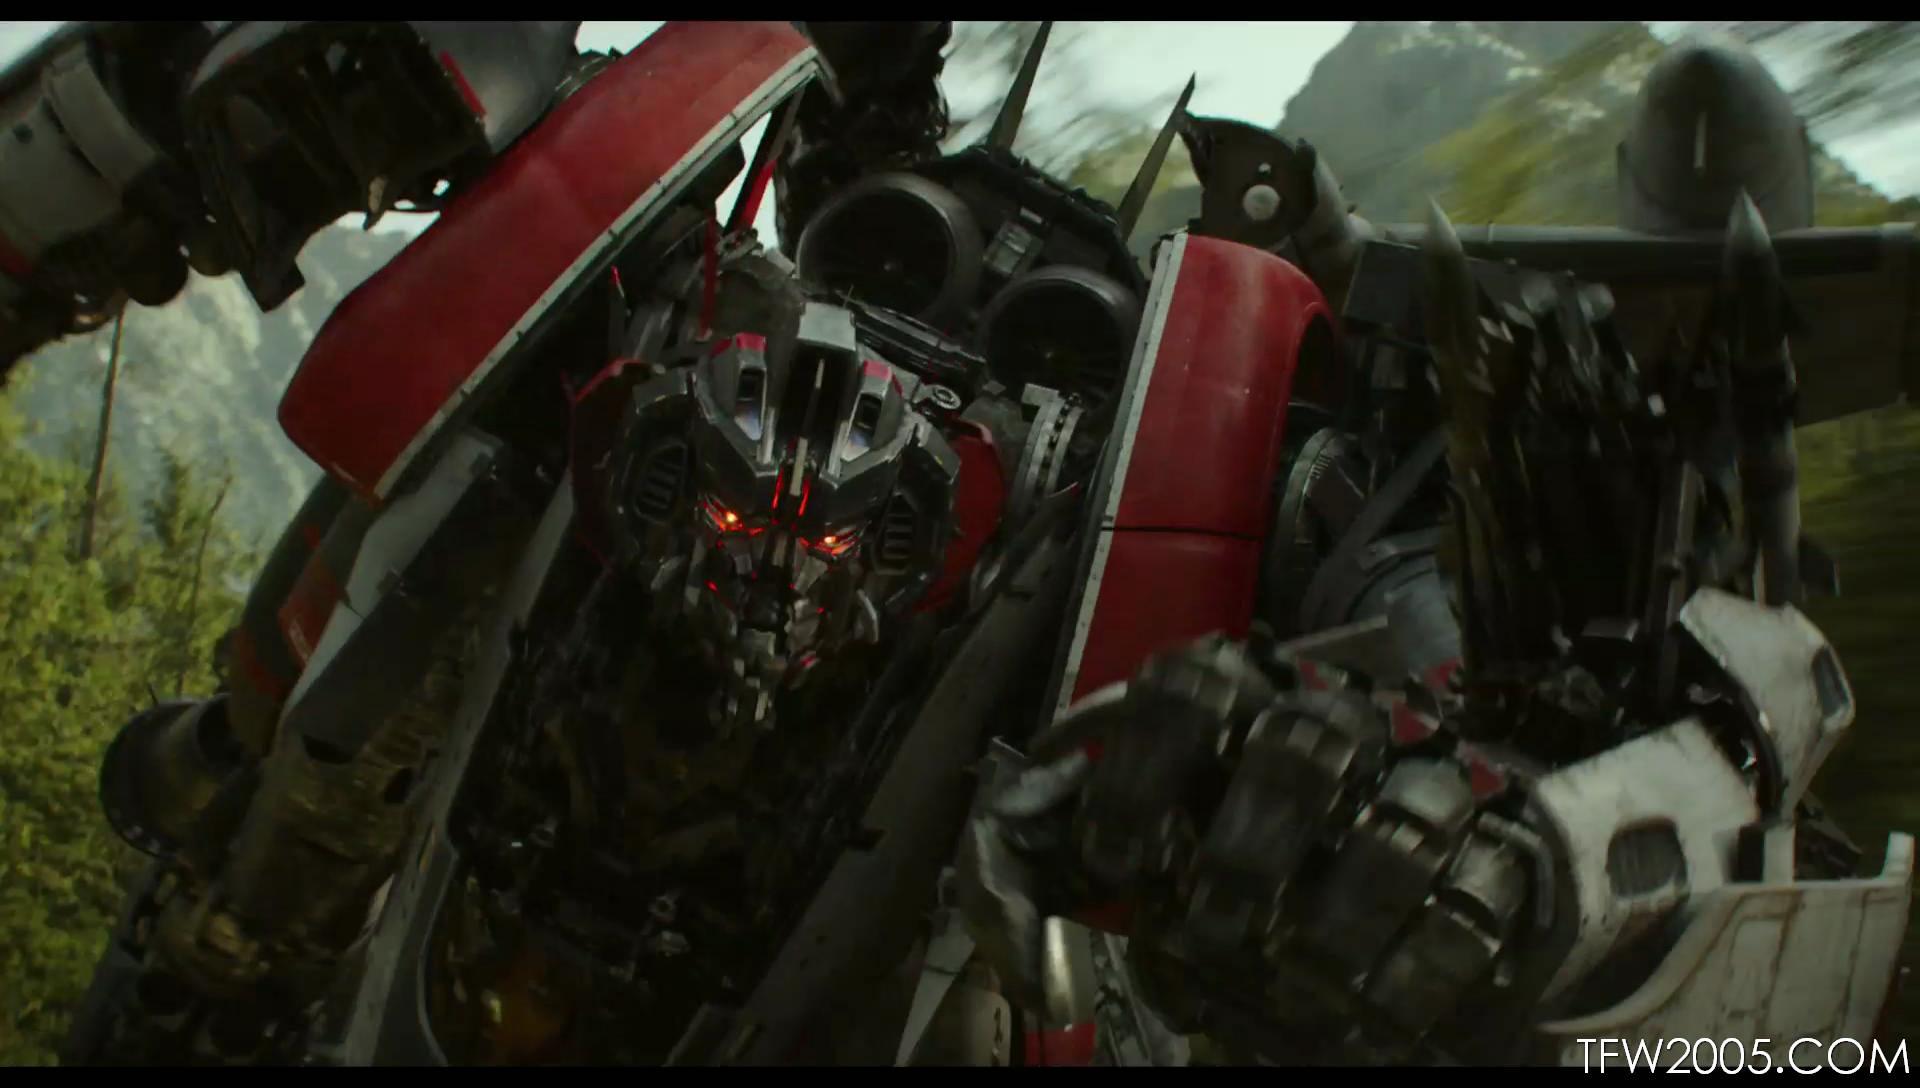 Movie trailer of transformers 2